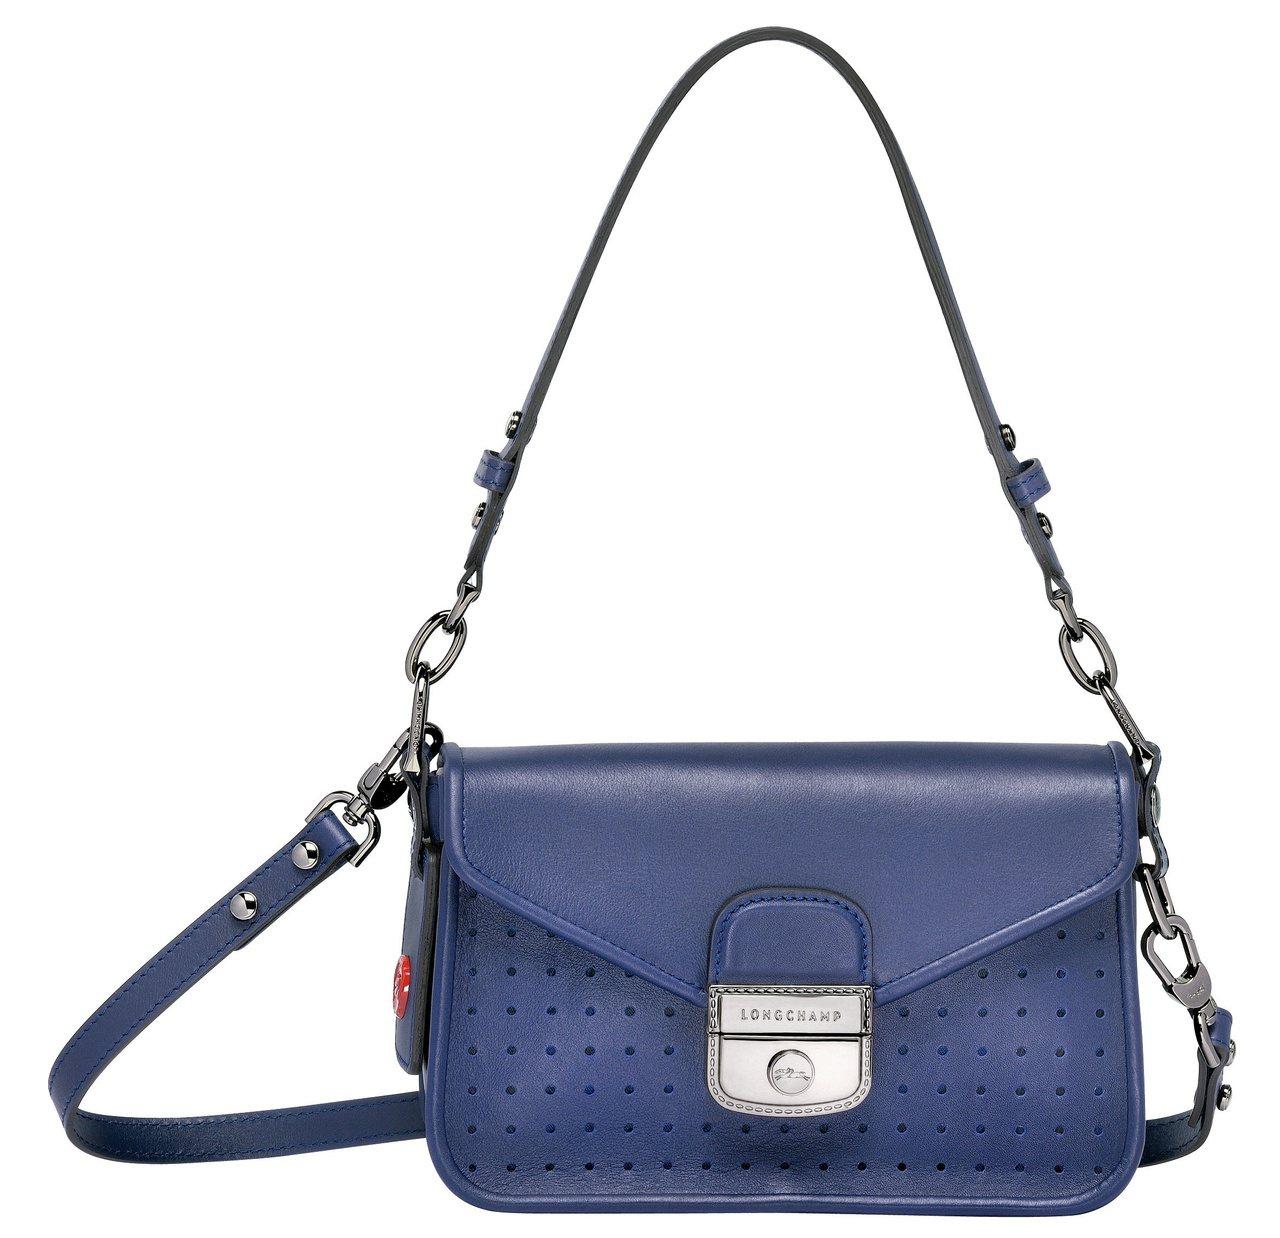 LONGCHAMP Mademoiselle Longchamp斜背袋,售價36...